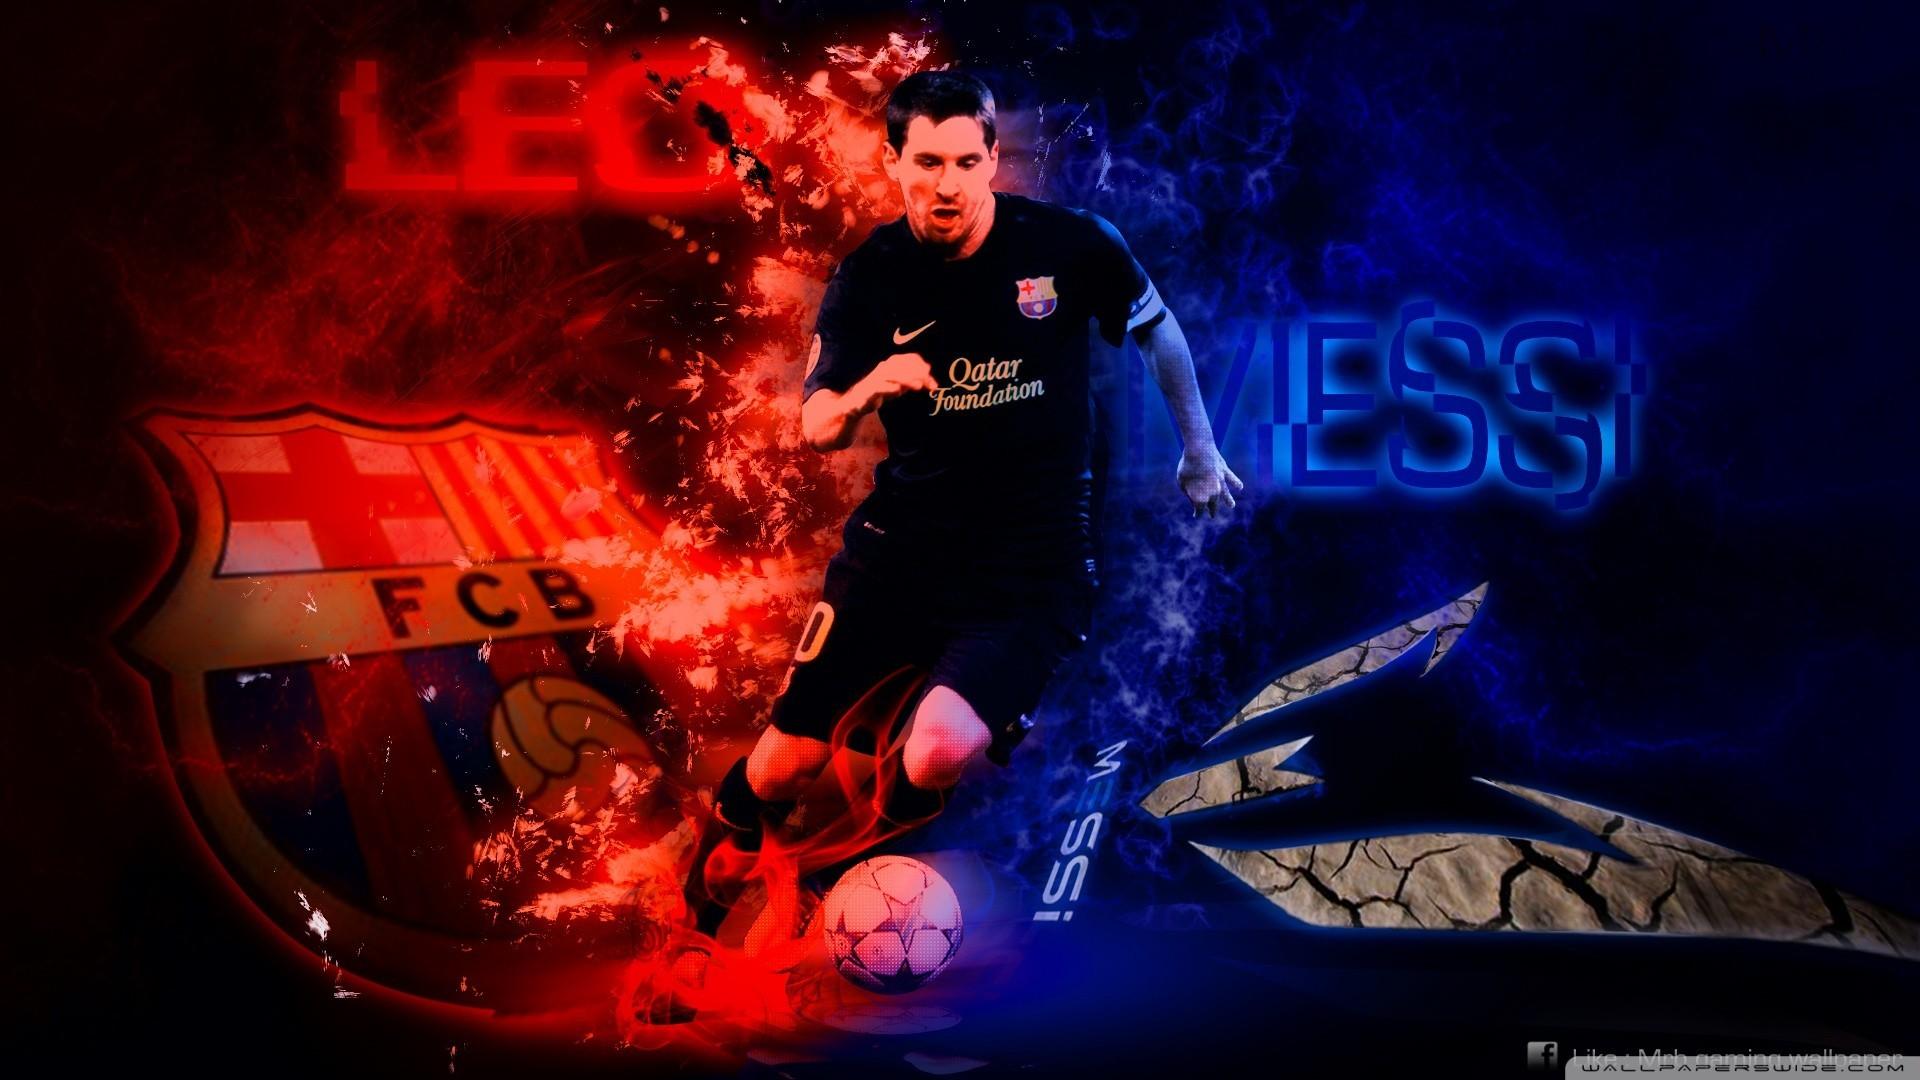 Beautiful Lionel Messi Back Wallpaper – FC Barcelona Wallpaper HD 2017 SJD7